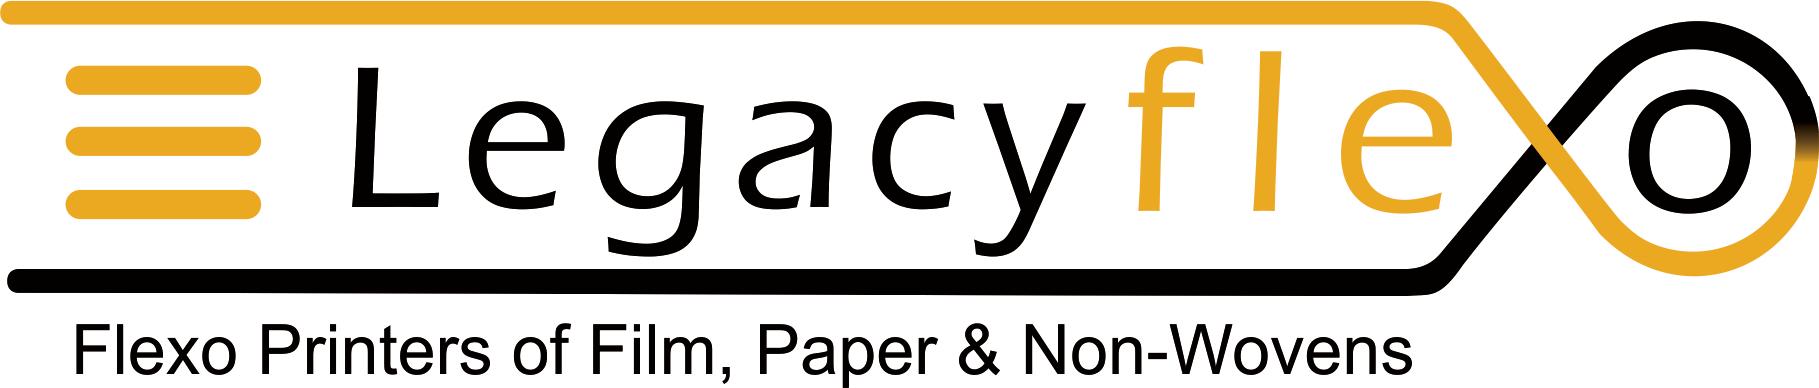 LegacyFlexo - Flexo Printers of Film, Paper & Non-Wovens